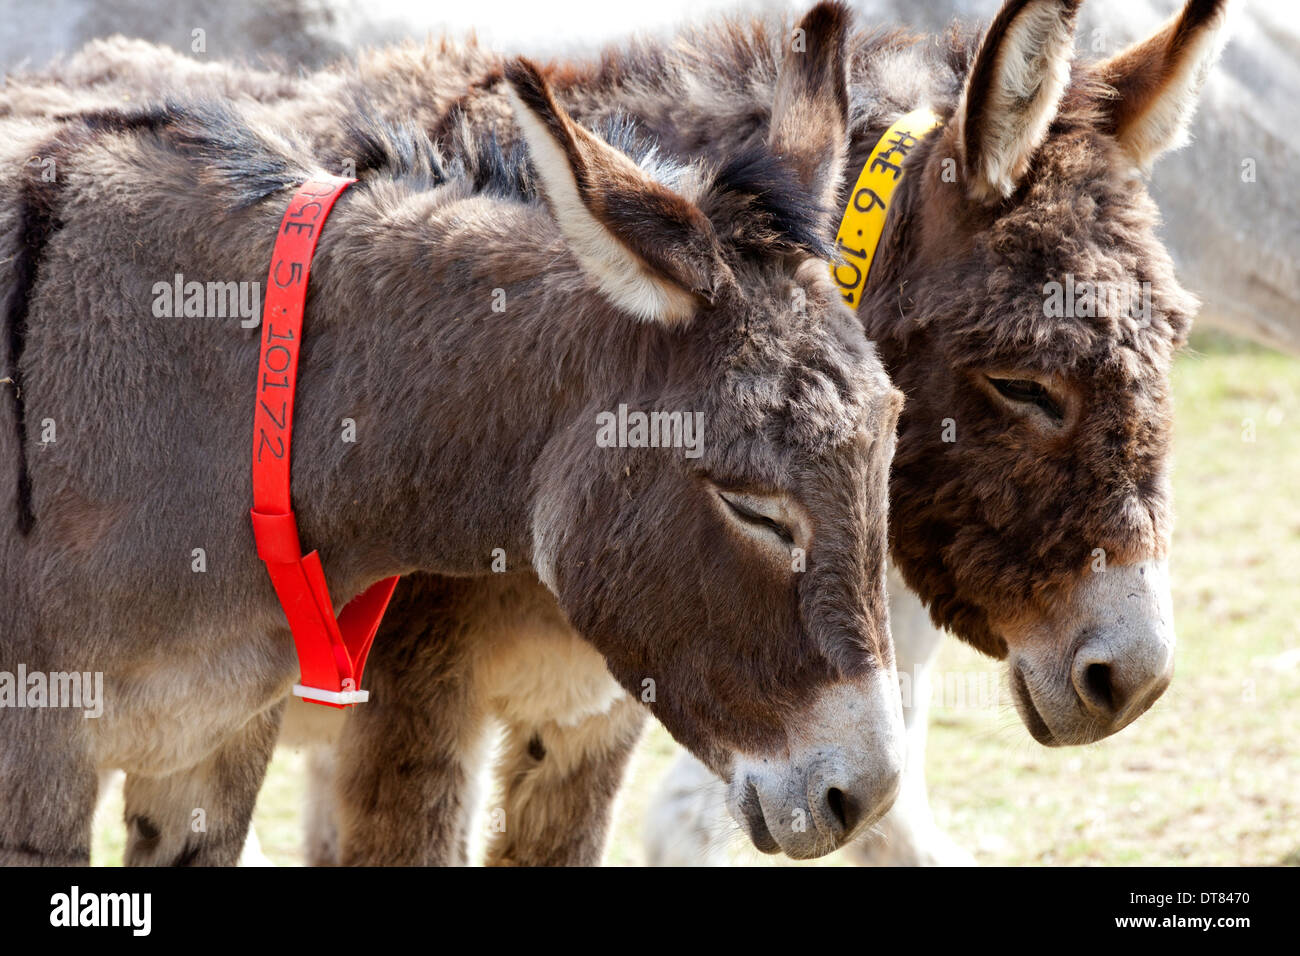 the-donkey-sanctuary-near-sidmouth-devon-DT8470.jpg